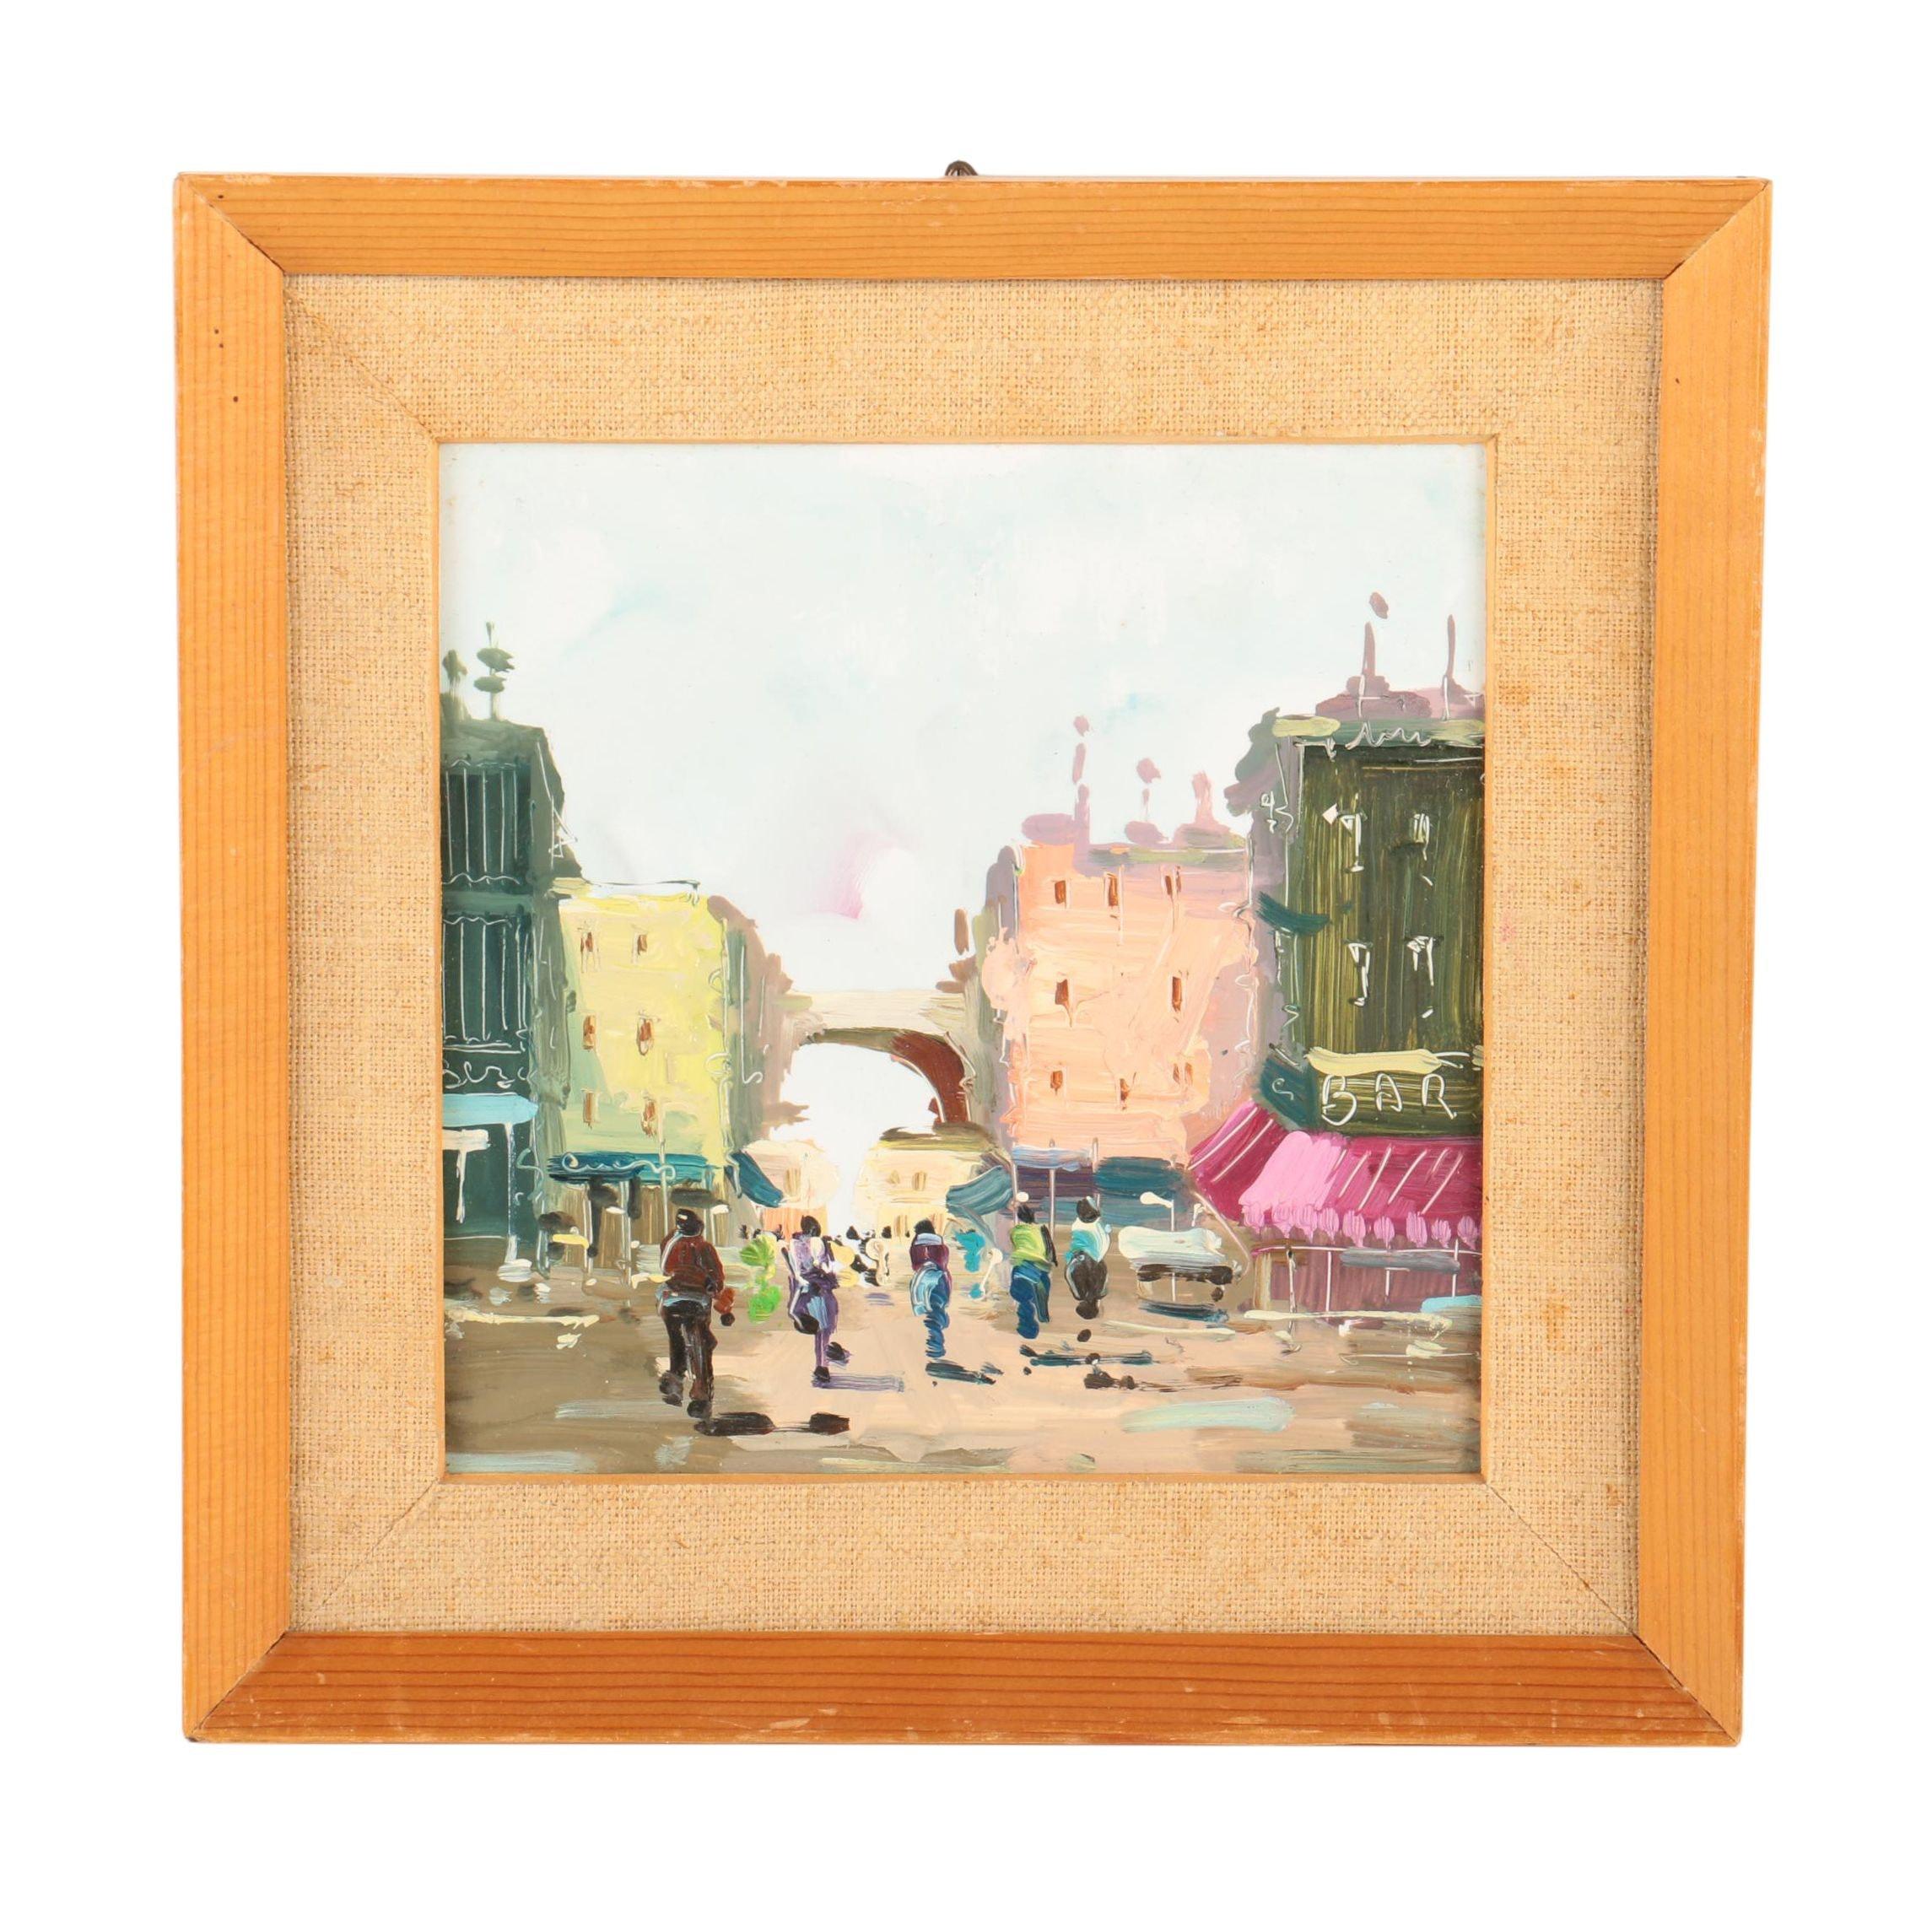 Oil on Masonite Painting of a Street Scene